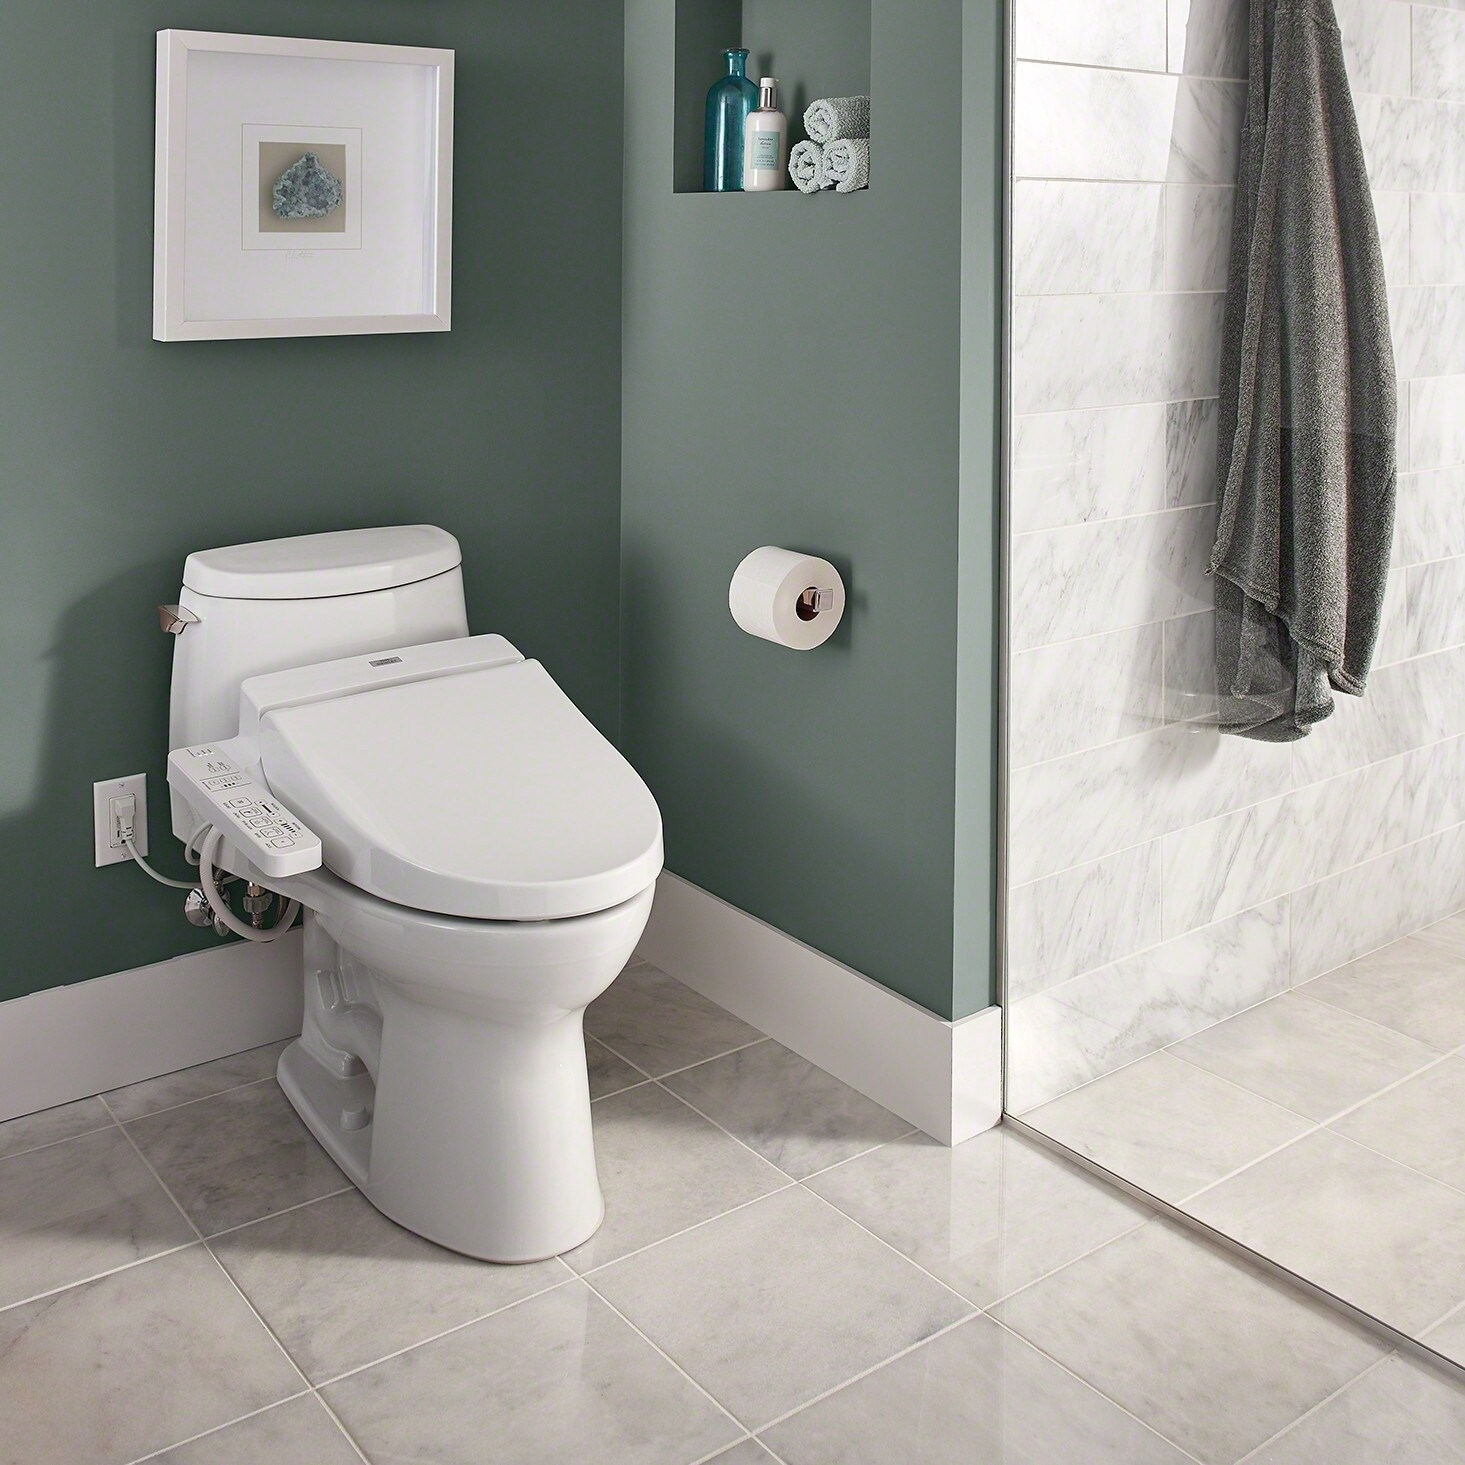 Shop Toto Washlet C100 Electronic Bidet Toilet Seat With Premist